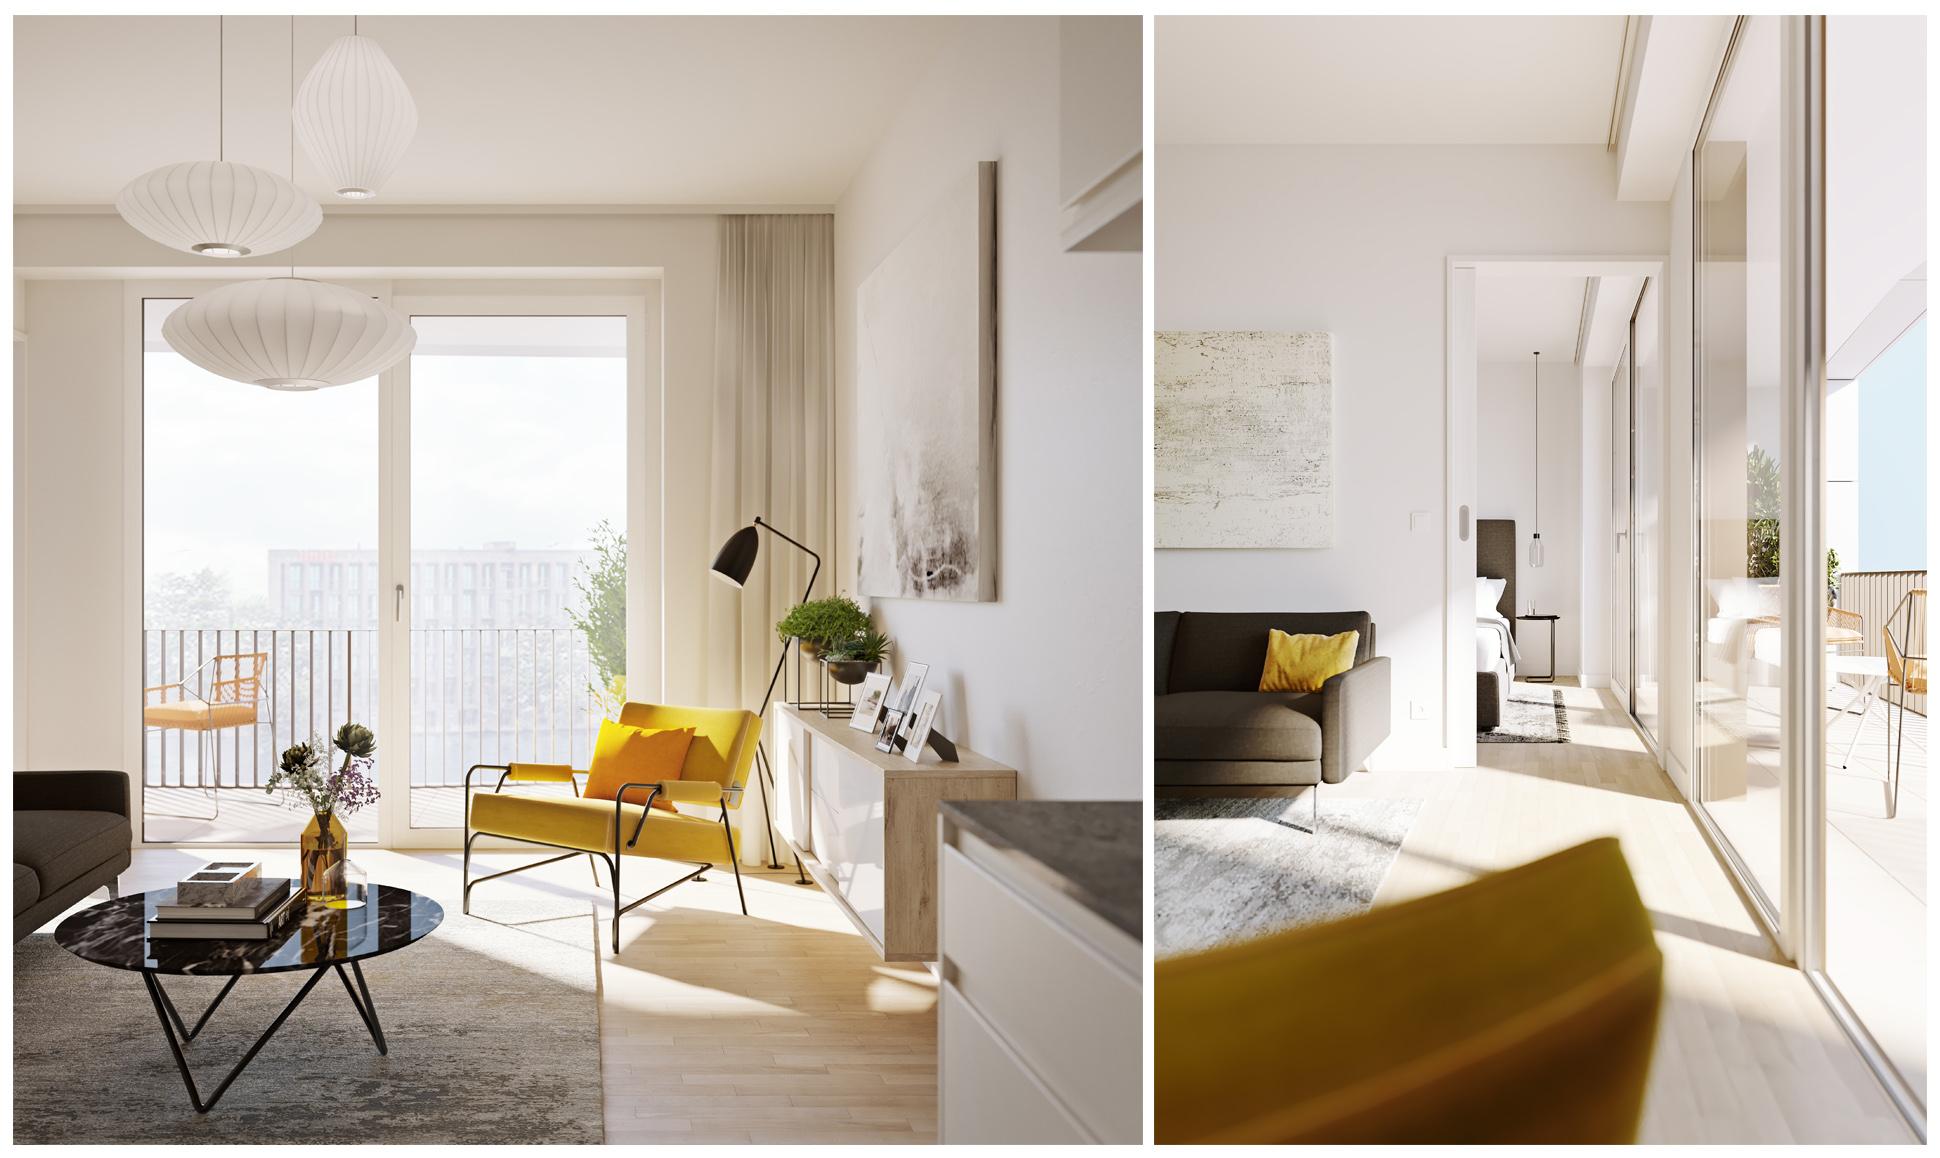 pure living berlin marketing visualization xoio. Black Bedroom Furniture Sets. Home Design Ideas